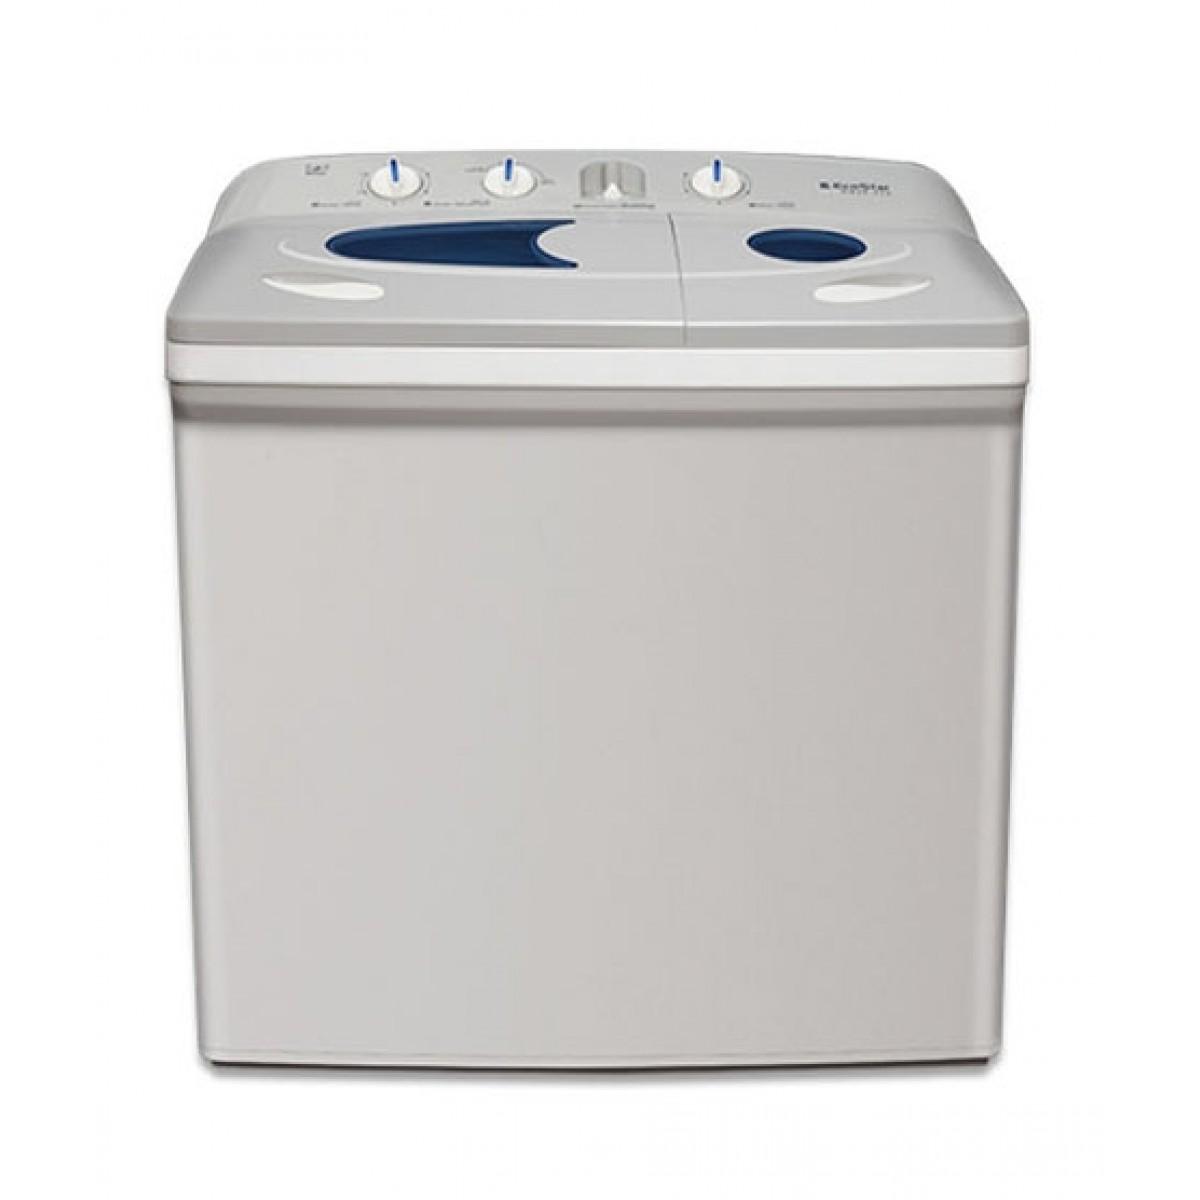 EcoStar Top Load Semi Automatic Washing Machine 8KG (WM-08-500)